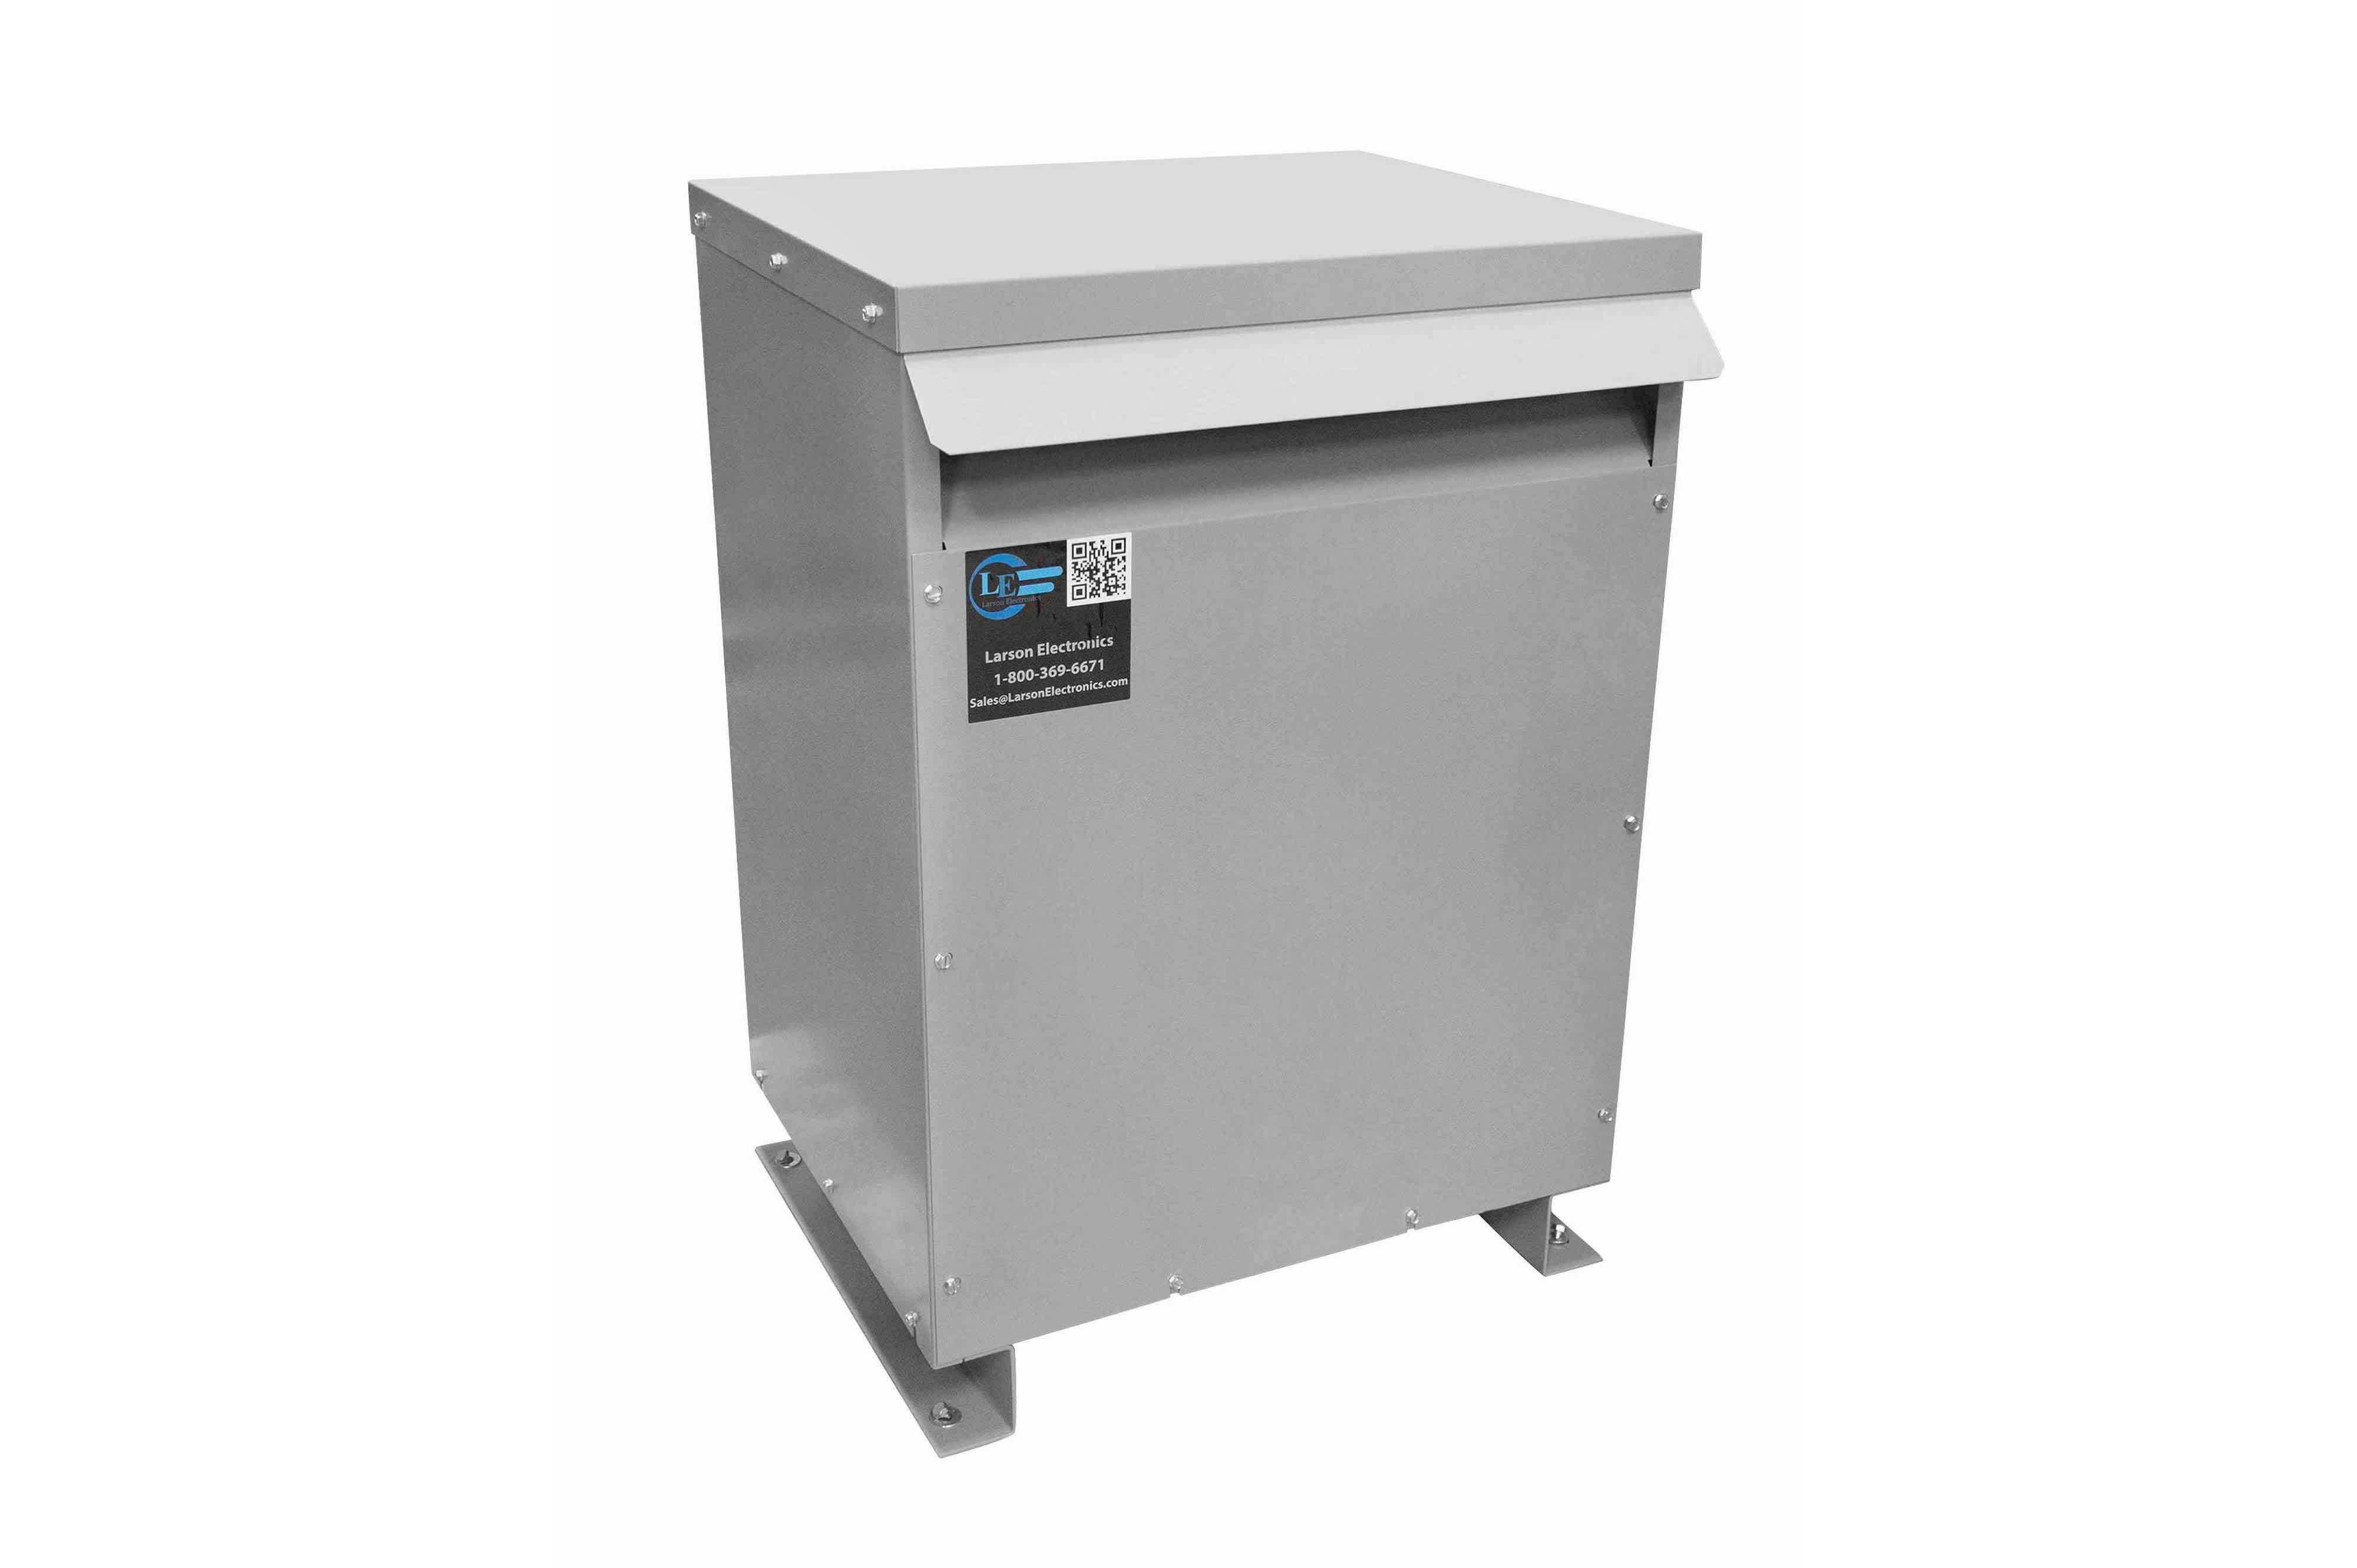 1000 kVA 3PH Isolation Transformer, 220V Wye Primary, 208V Delta Secondary, N3R, Ventilated, 60 Hz